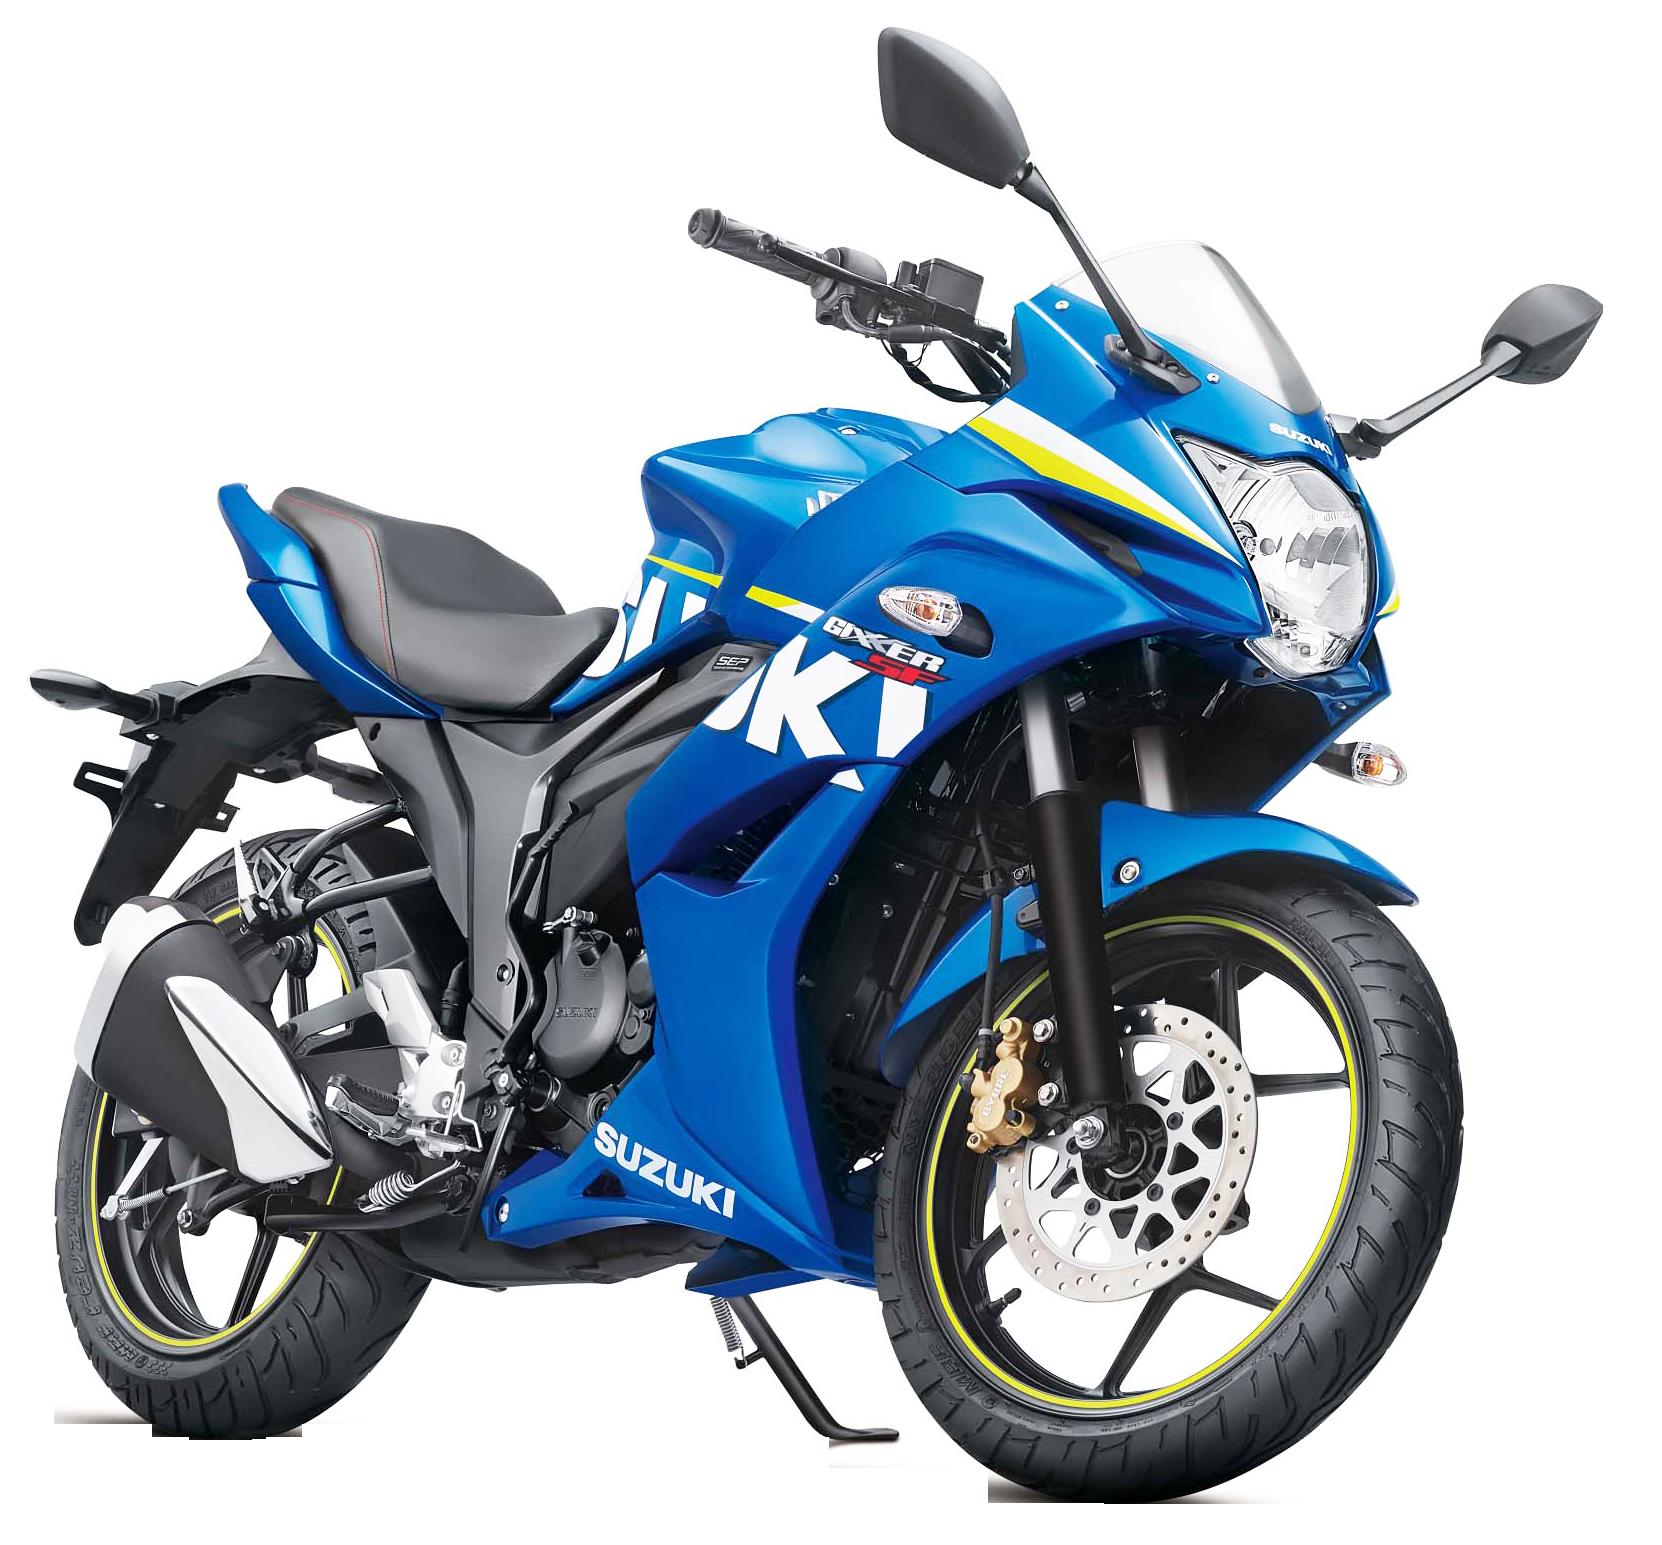 Suzuki PNG-PlusPNG.com-1662 - Suzuki PNG